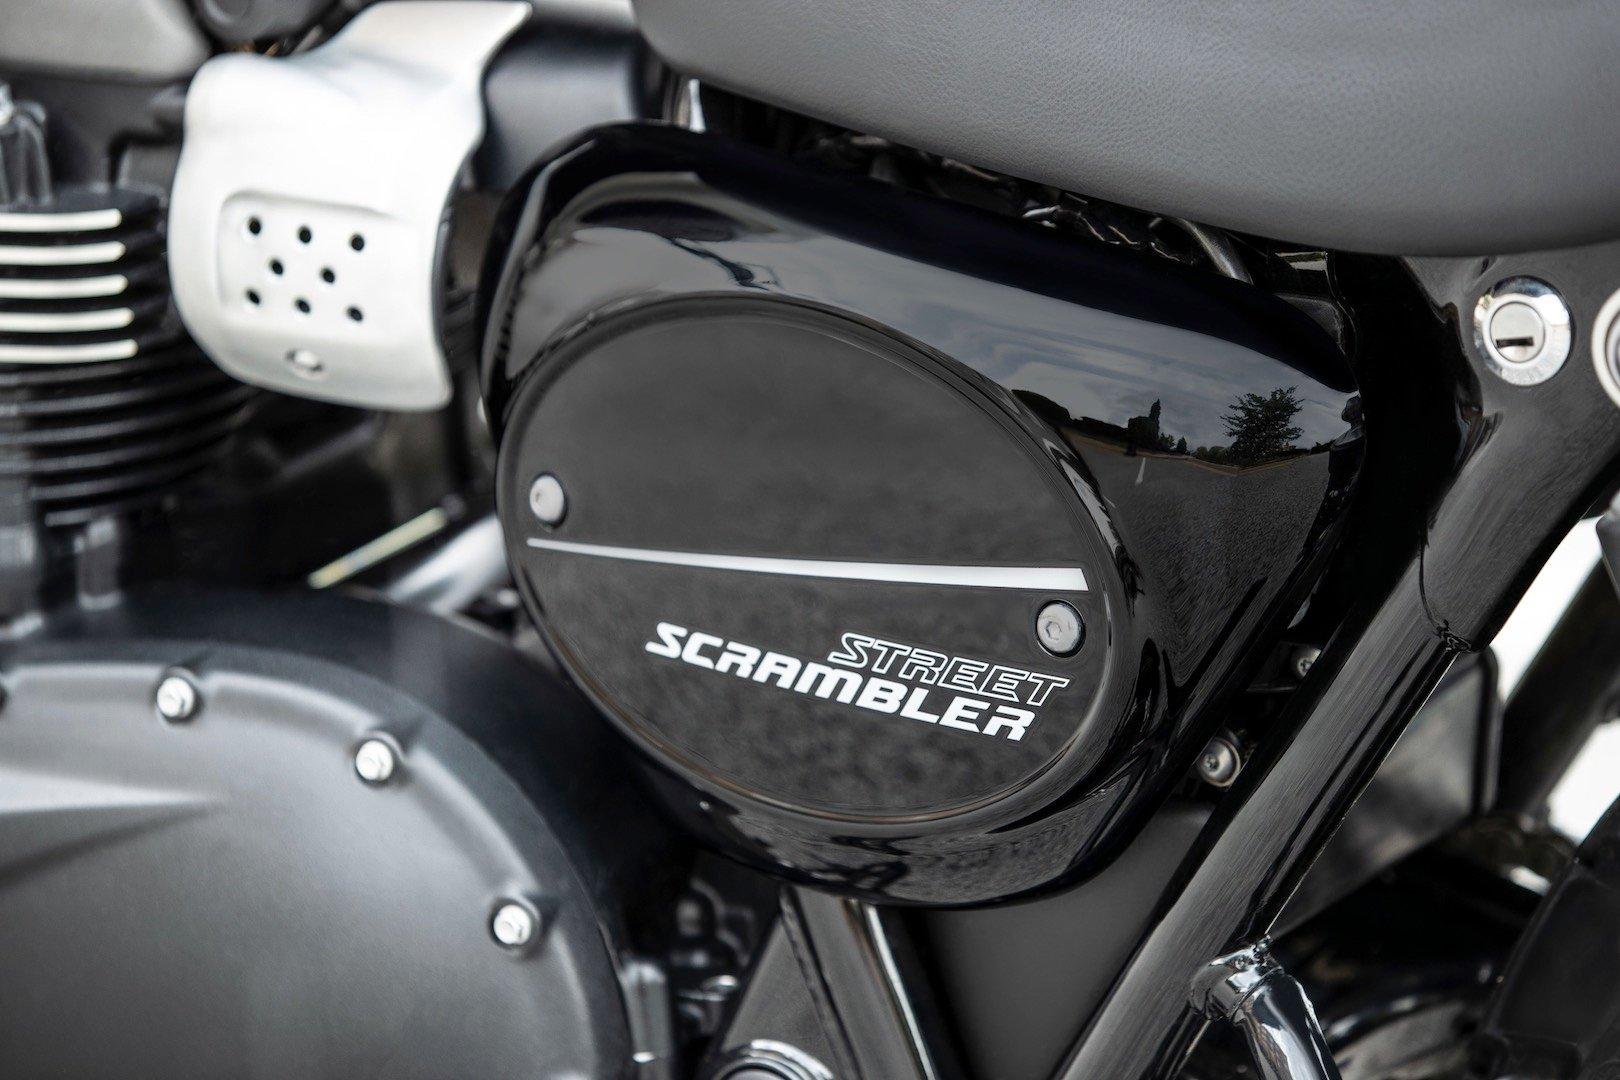 2019 Triumph Street Scrambler First Look number plate